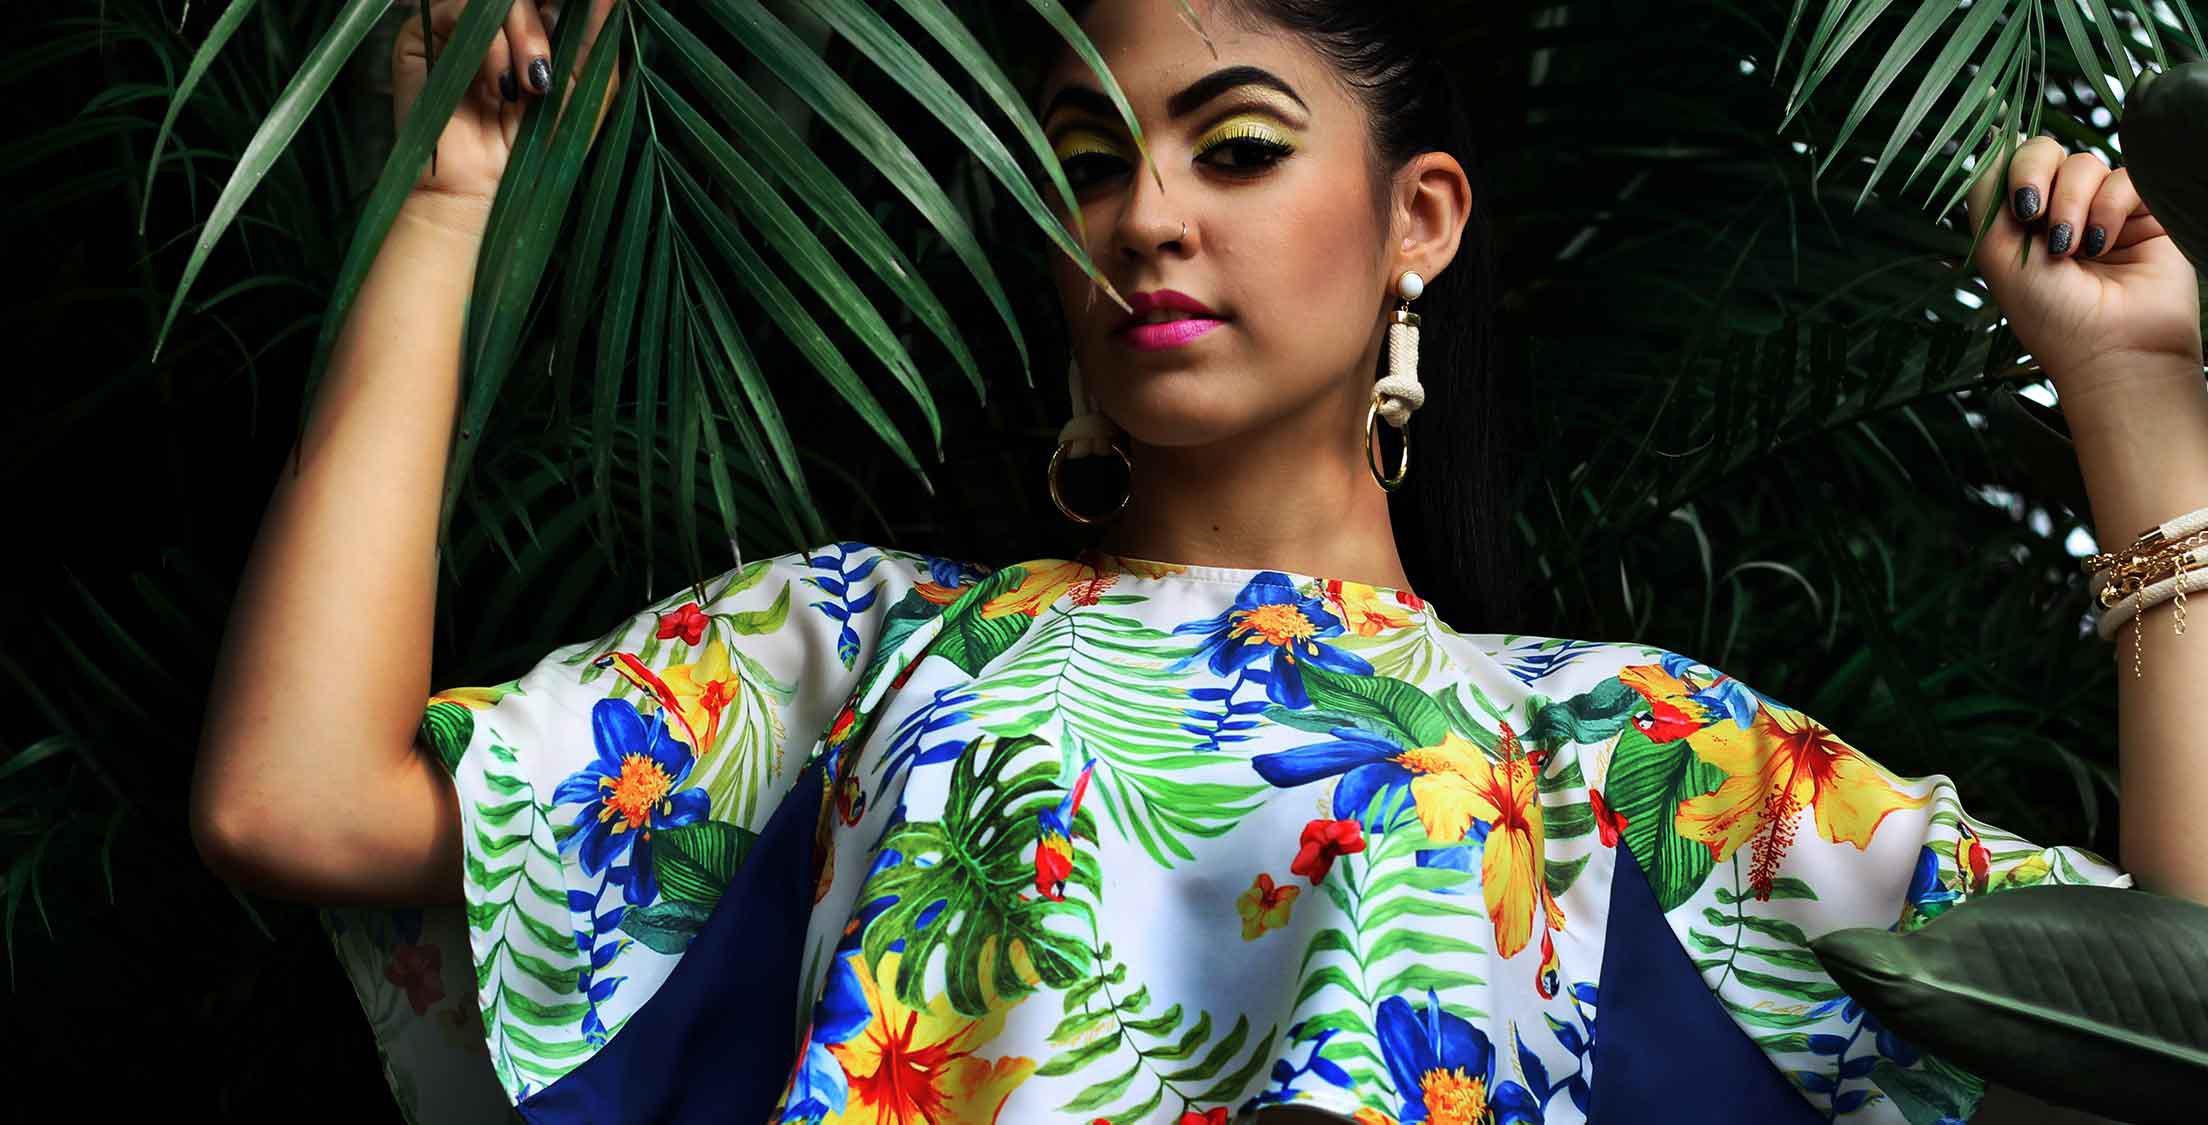 3-ways-to-wear-tropical-prints